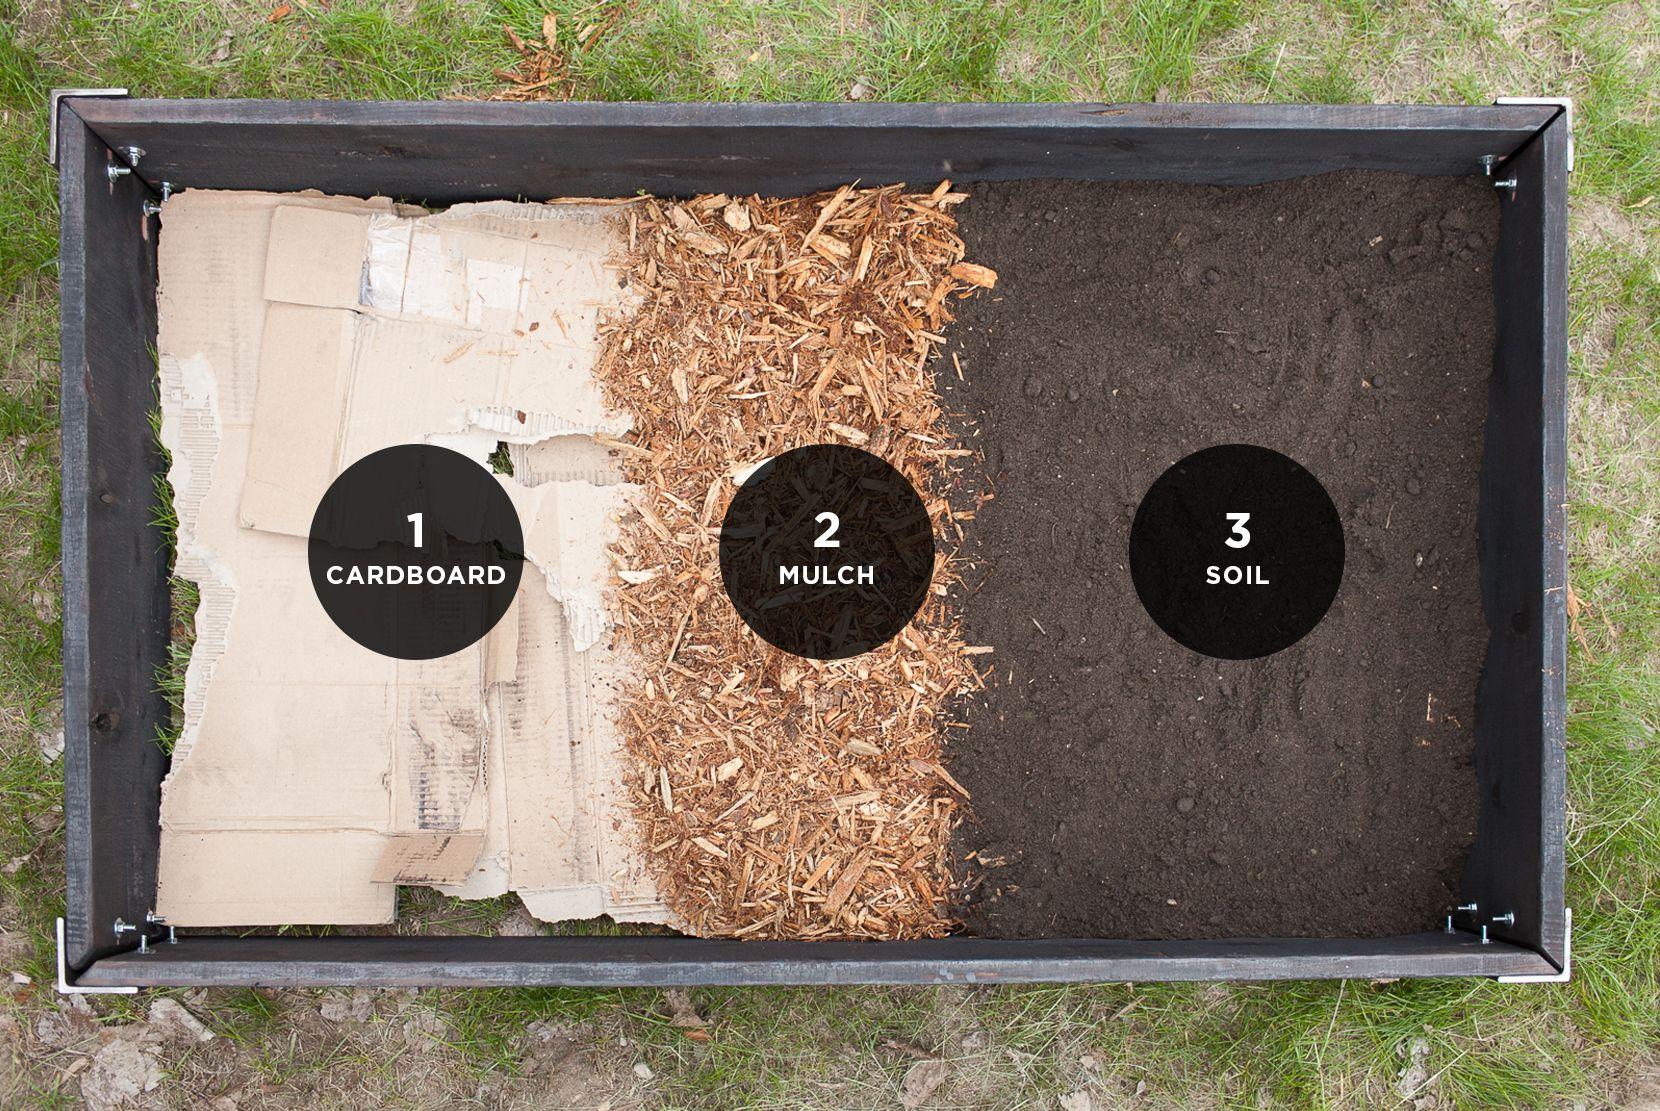 raised garden bed layers the fresh exchange cardboard mulch soil  [ 1660 x 1111 Pixel ]